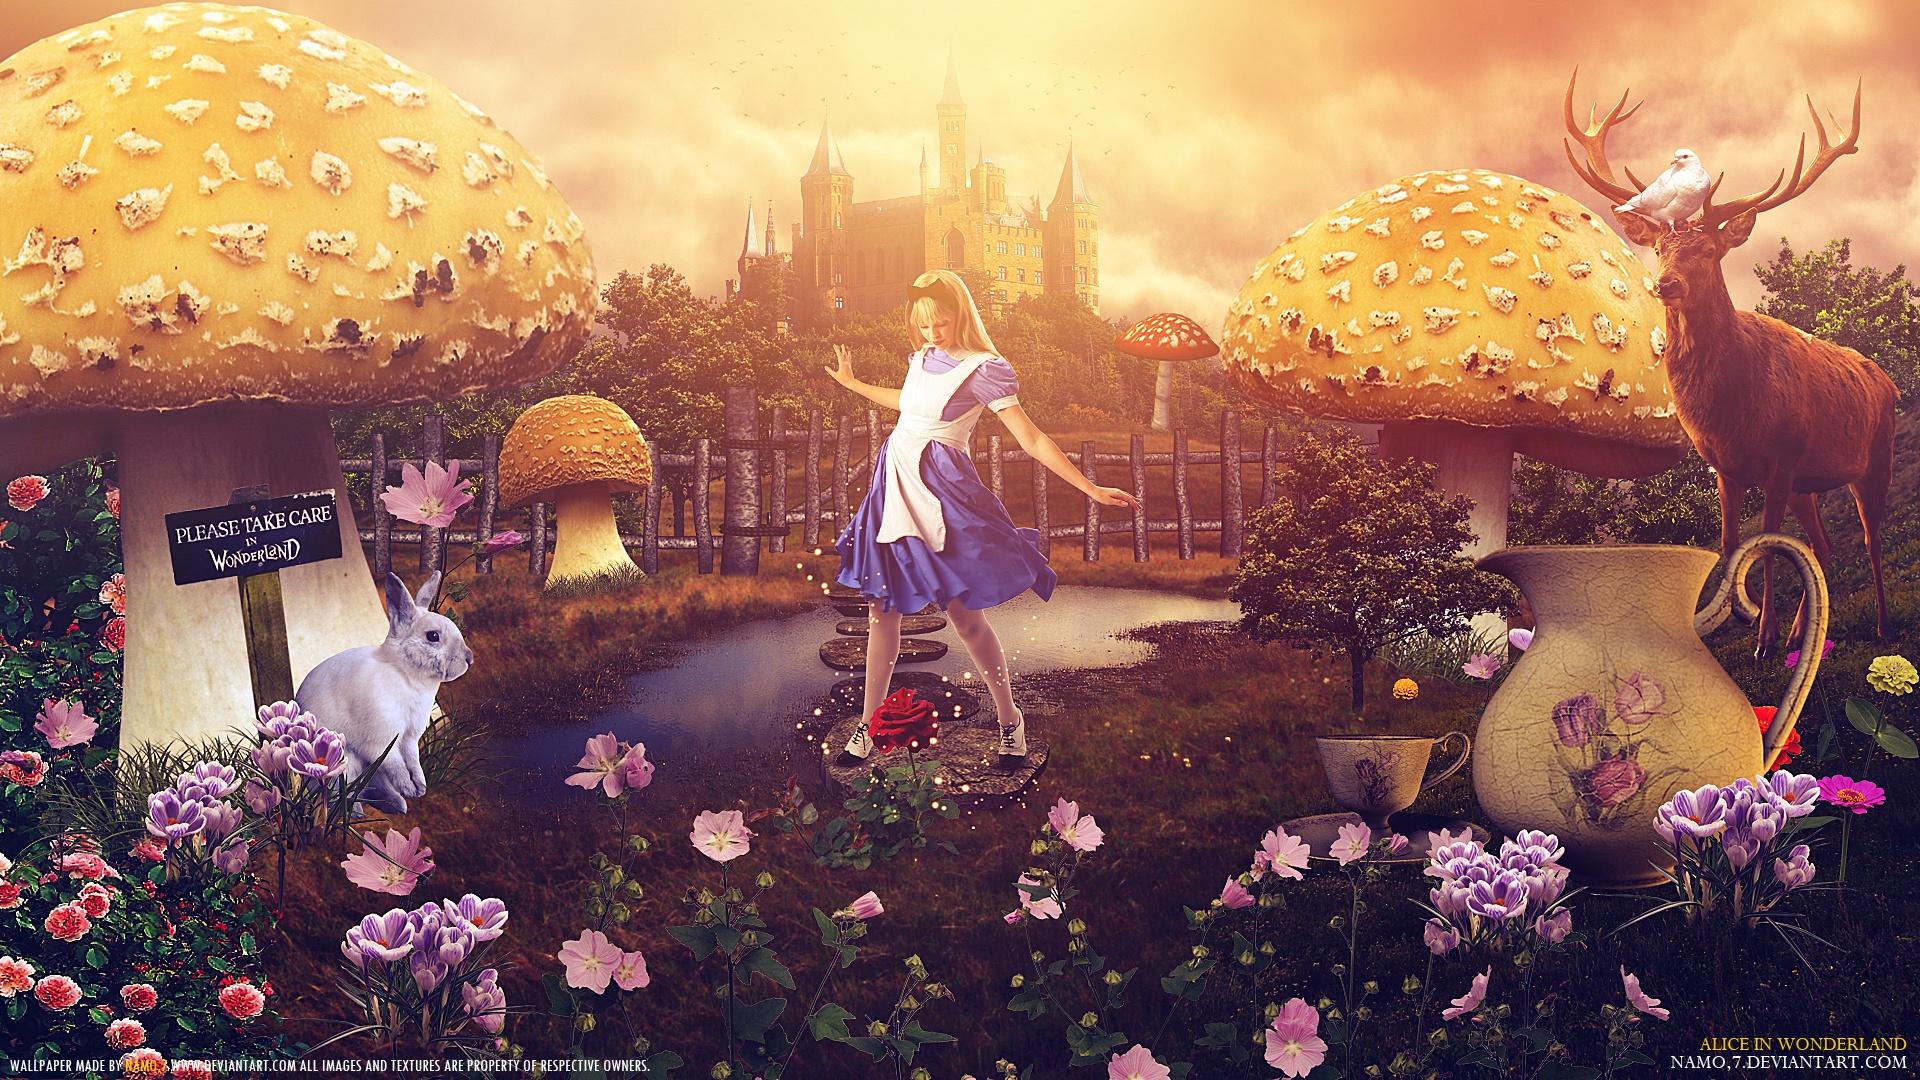 Wallpaper Alice In Wonderland Creative Picture 1920x1080 Full Hd